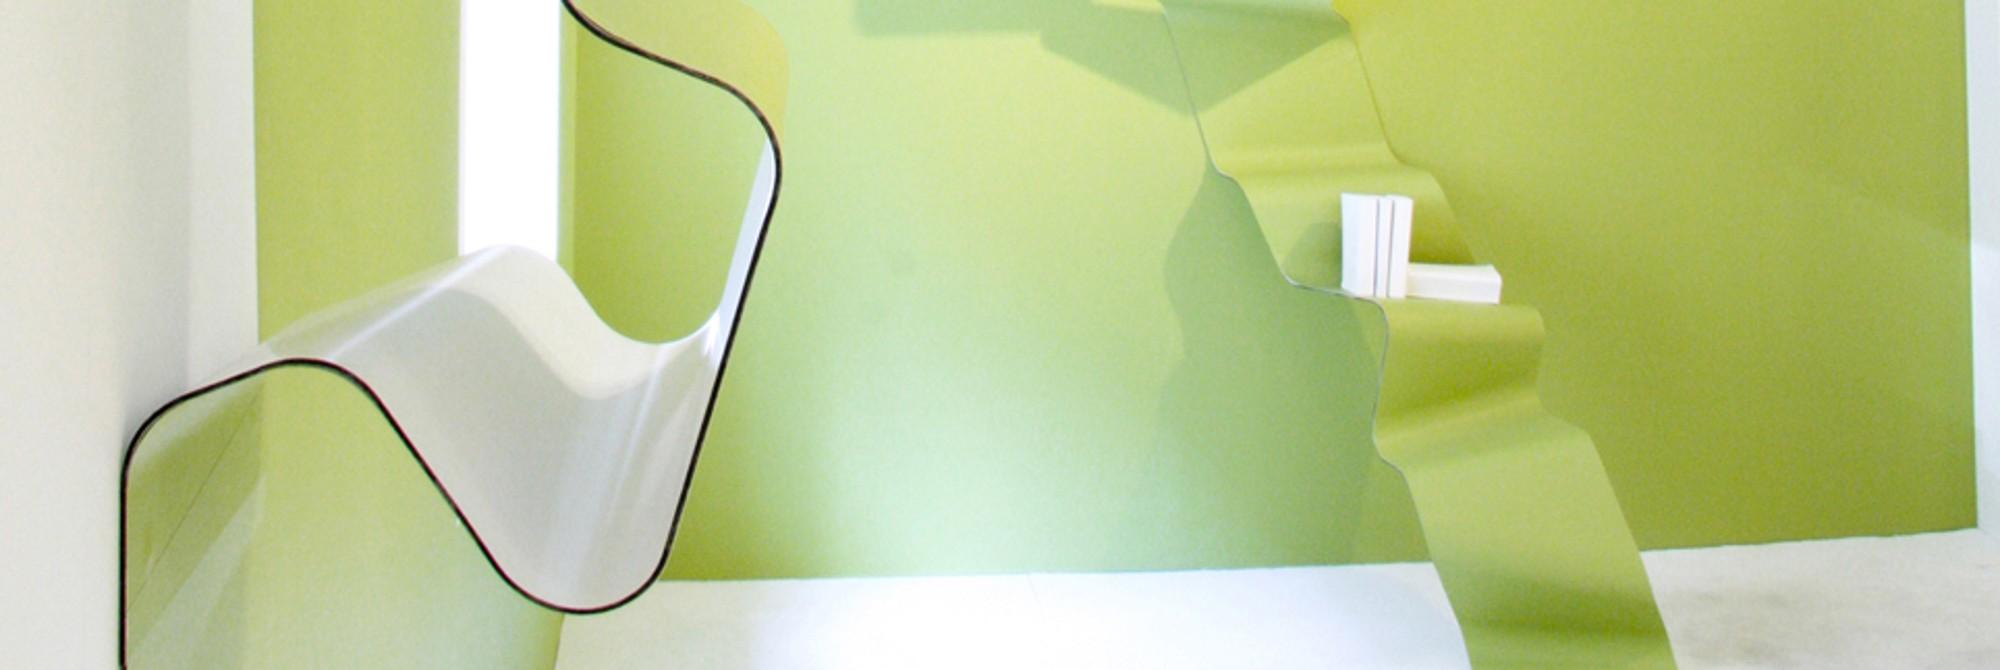 DIBOND® - ©3A Composites | Designer: Andreas Hegert